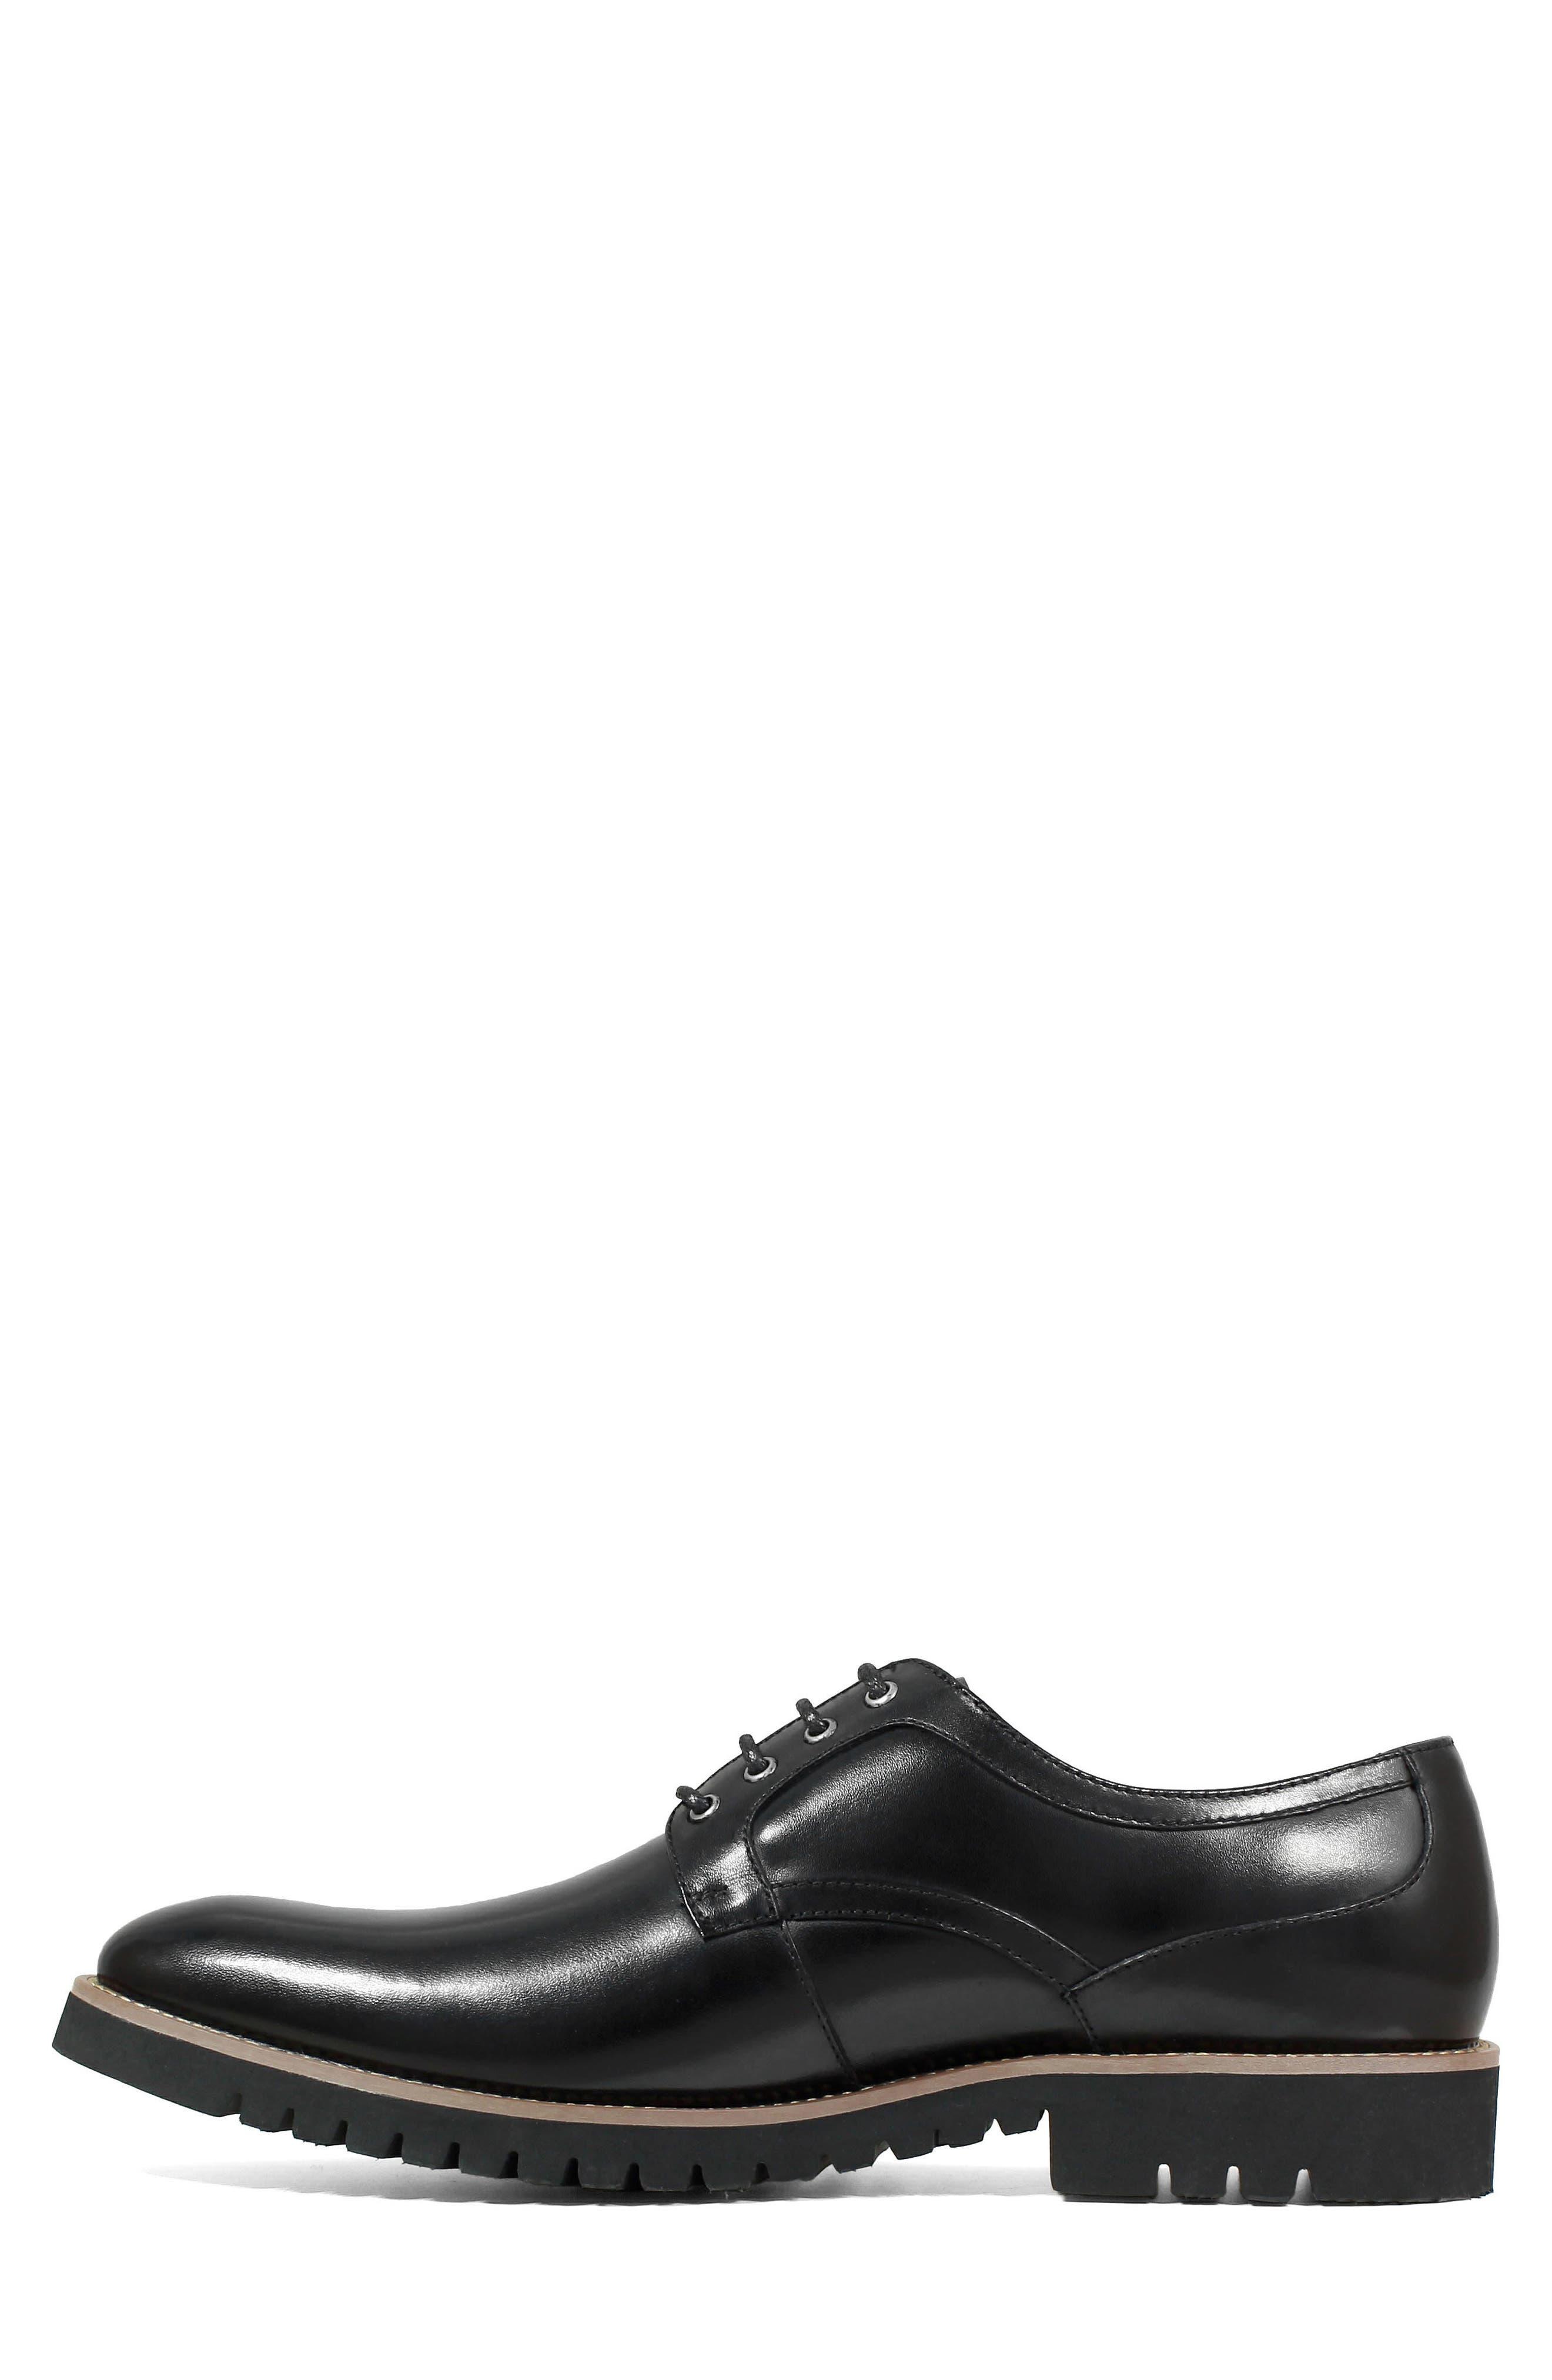 Barclay Plain Toe Derby,                             Alternate thumbnail 3, color,                             BLACK LEATHER